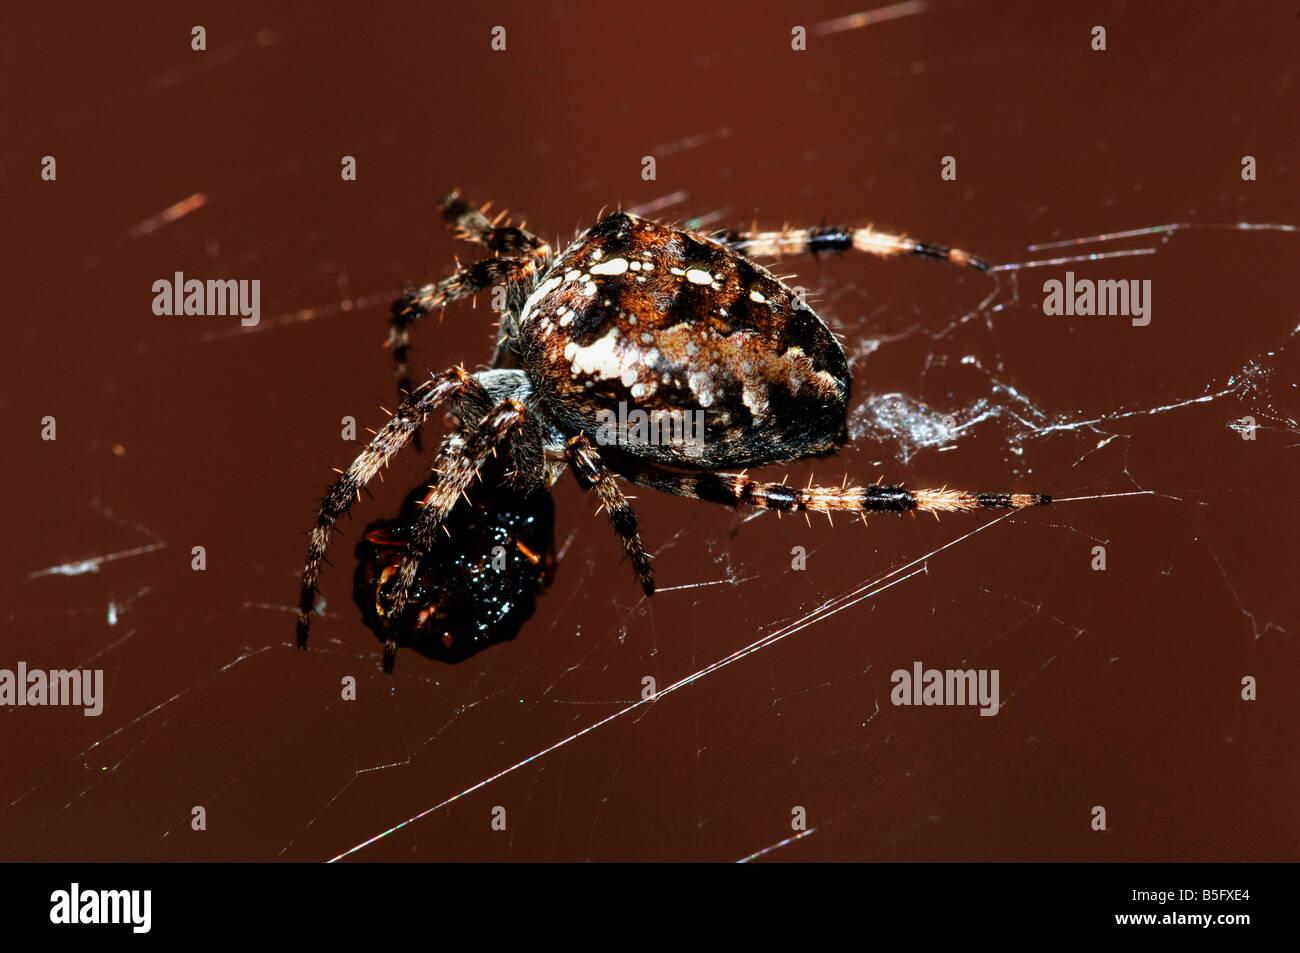 A Garden Spider Araneus diadematus Feeding off the remains of its prey - Stock Image